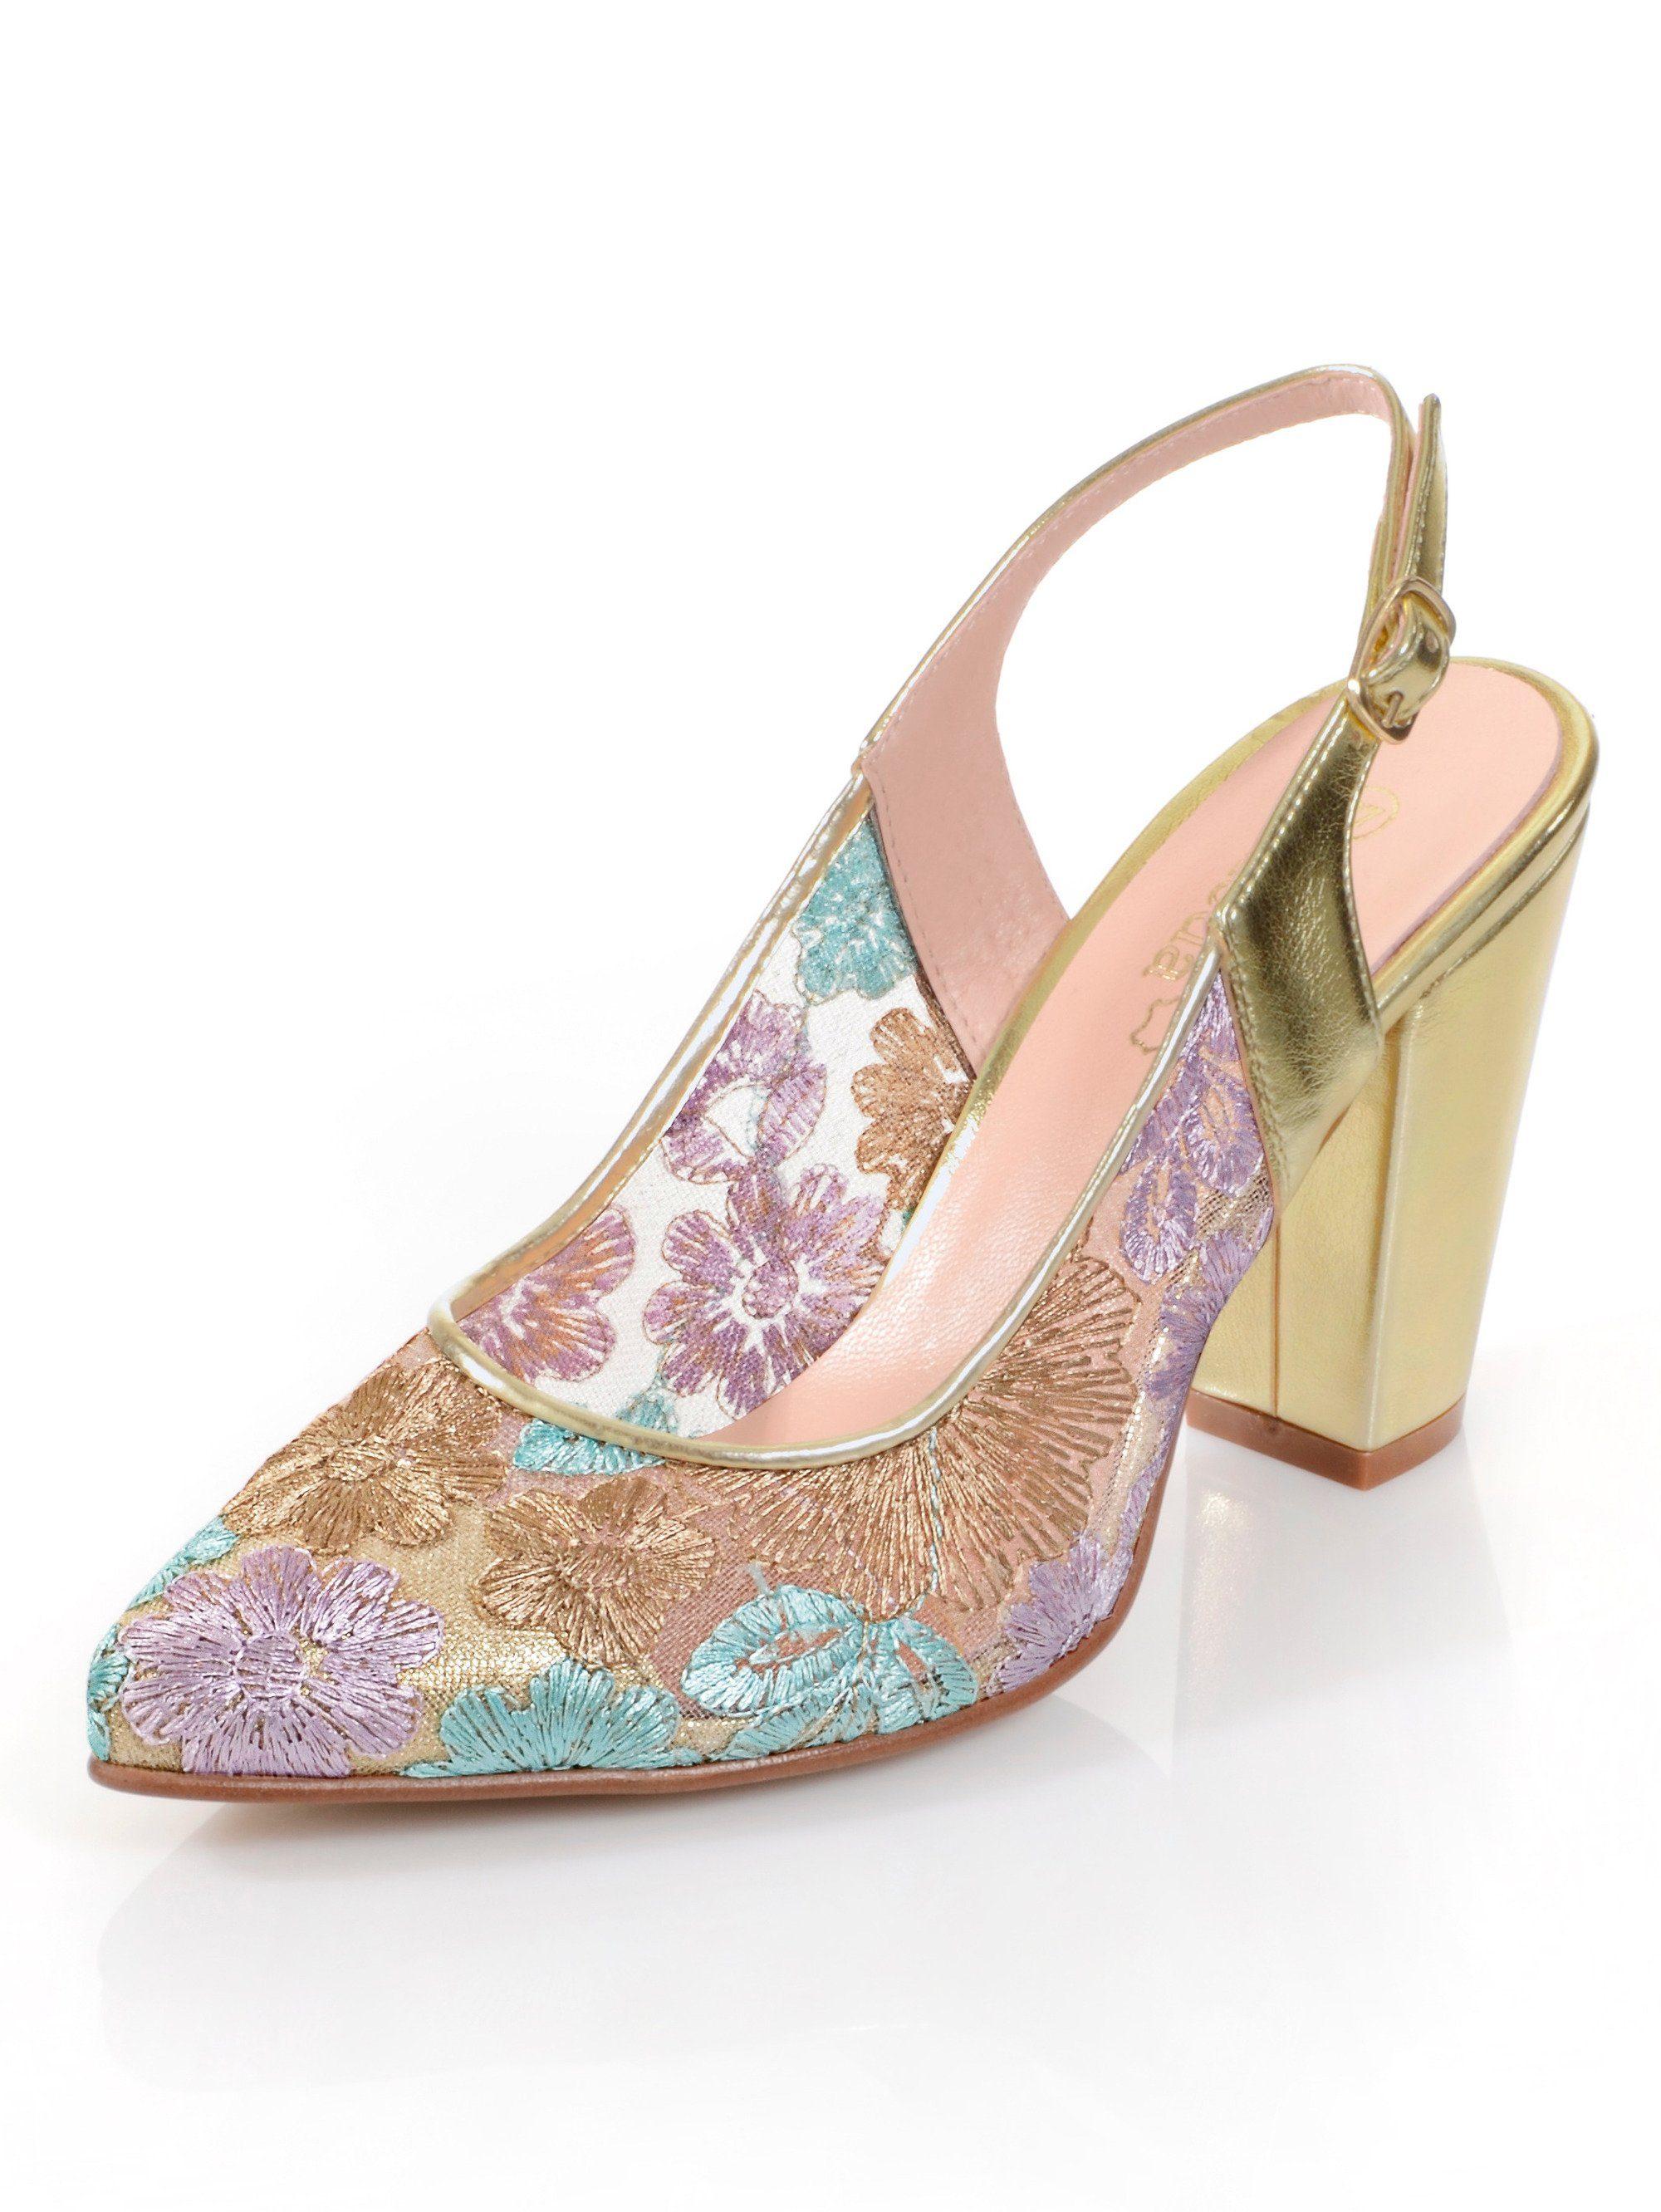 Alba Moda Slingpumps mit Blumenmuster kaufen  gold-multi